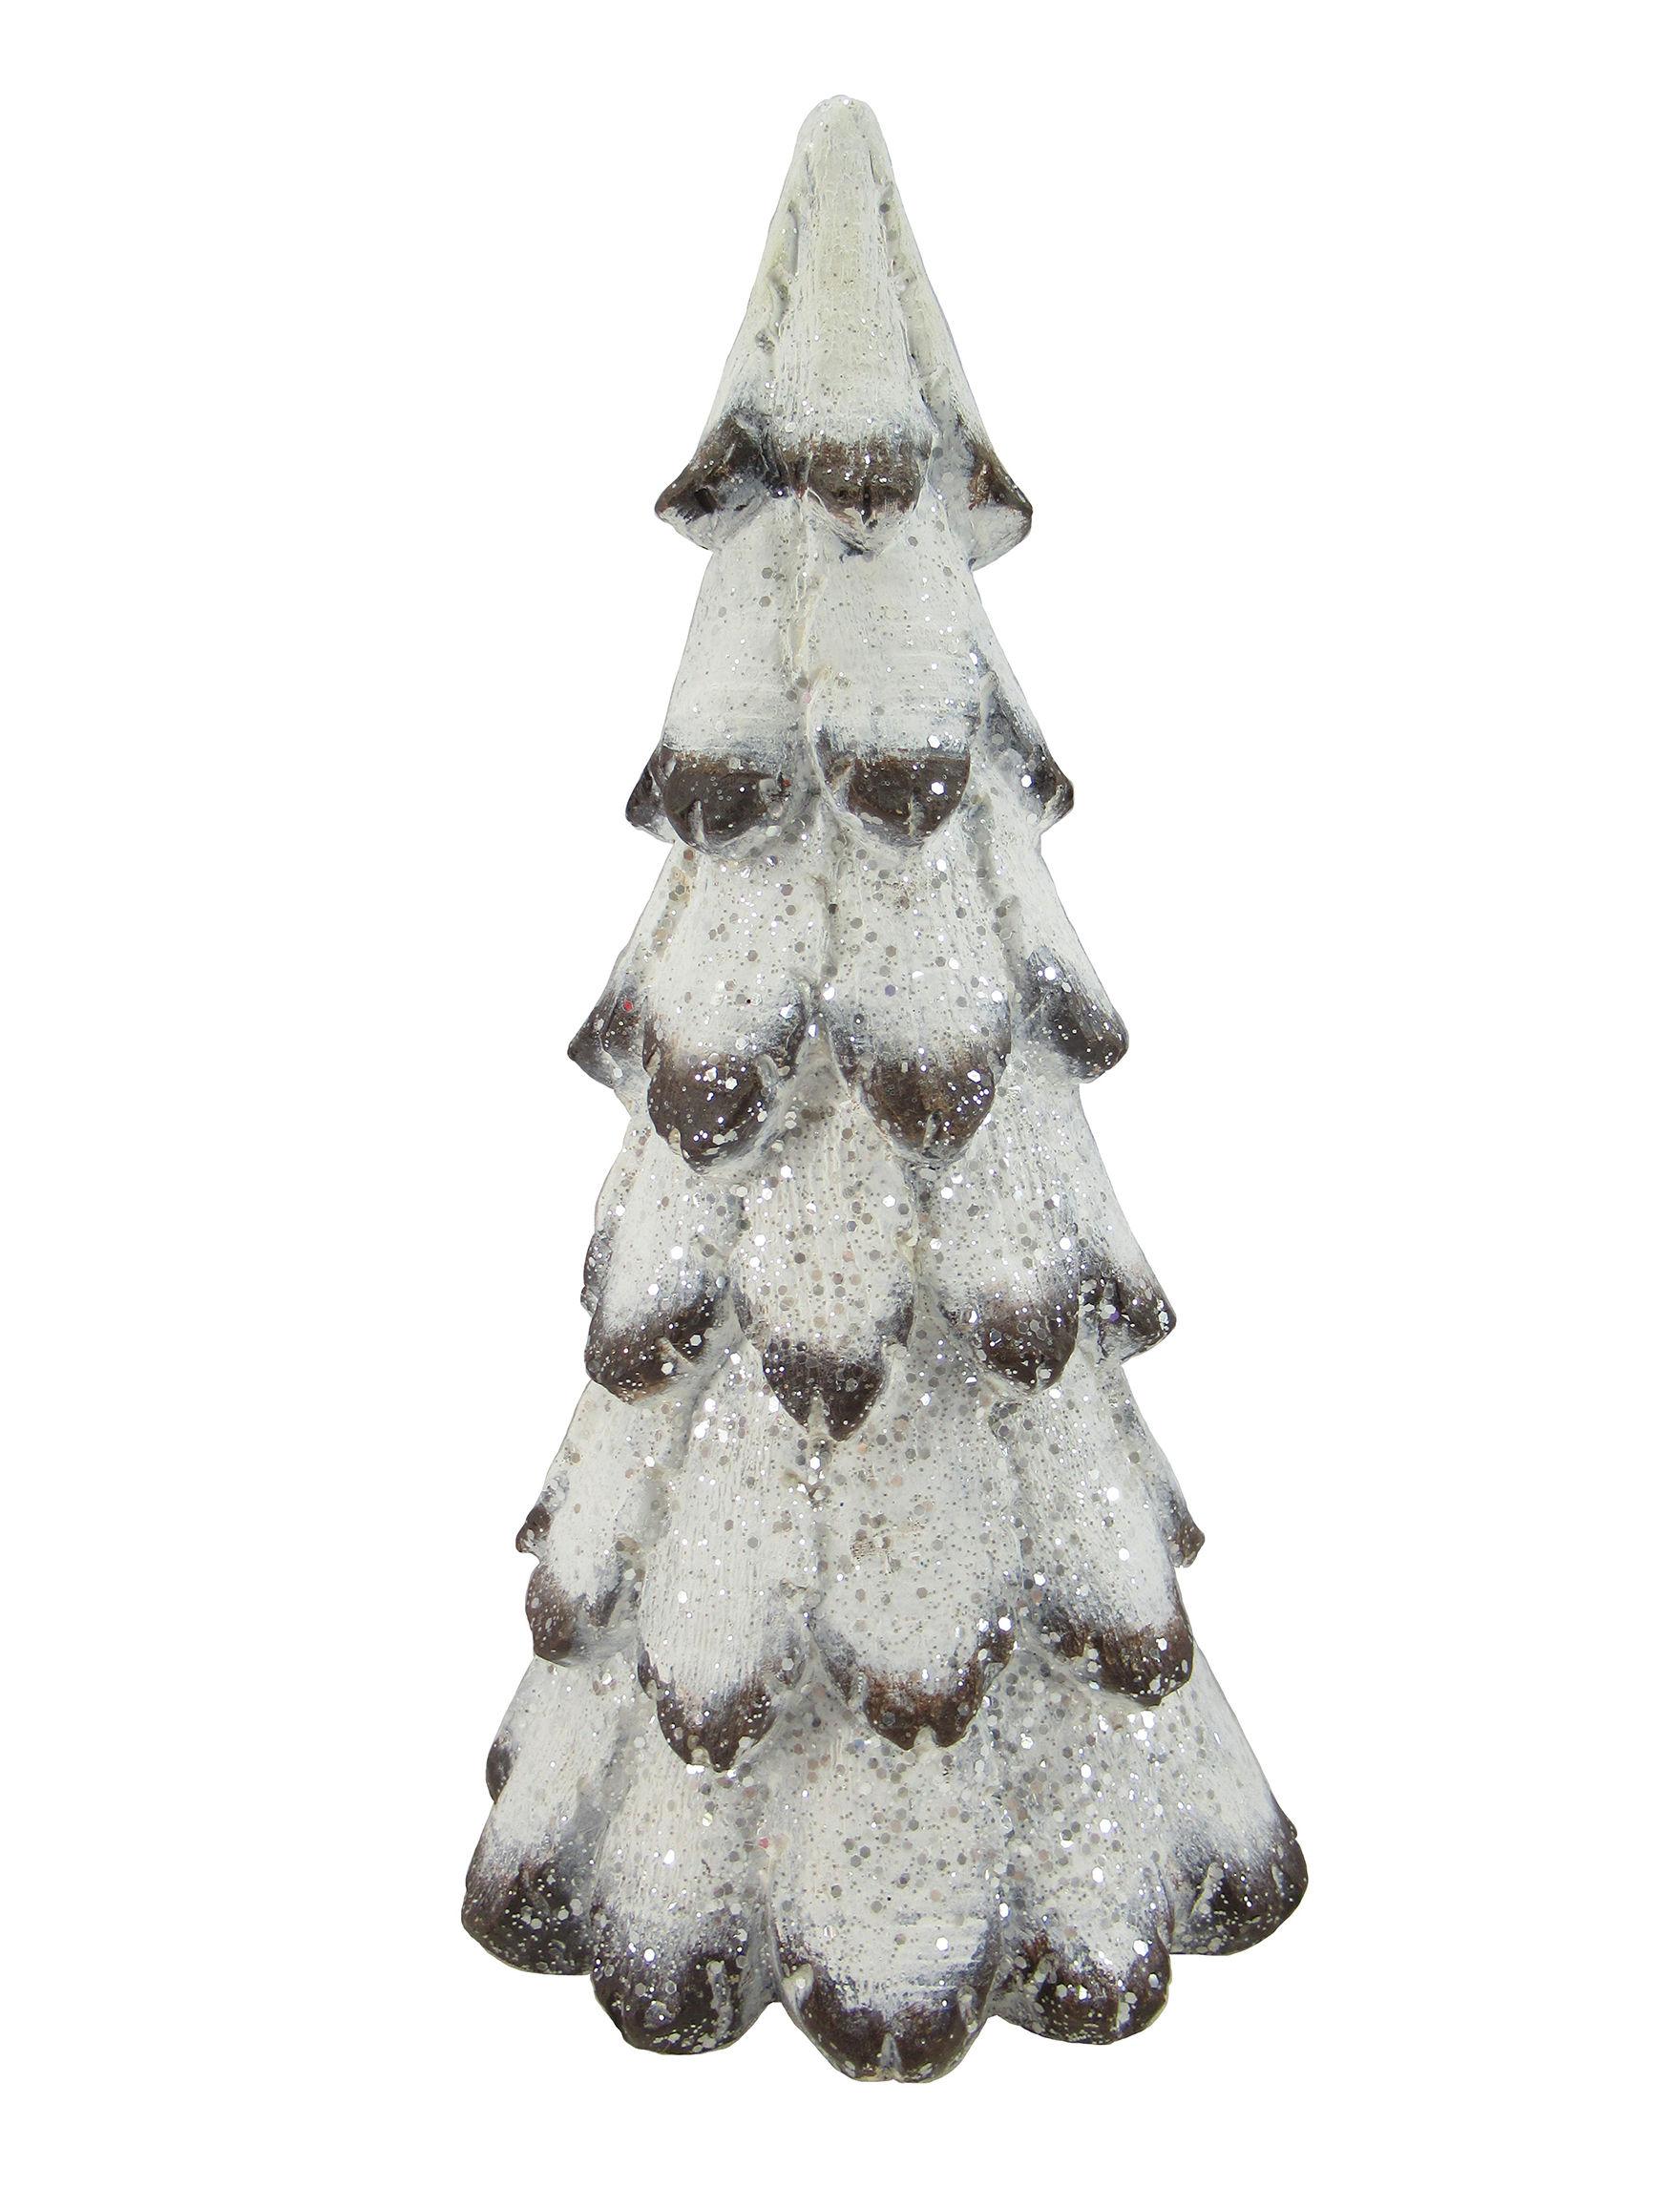 Novelty Trading Corp. White / Glitter Christmas Trees Decorative Objects Holiday Decor